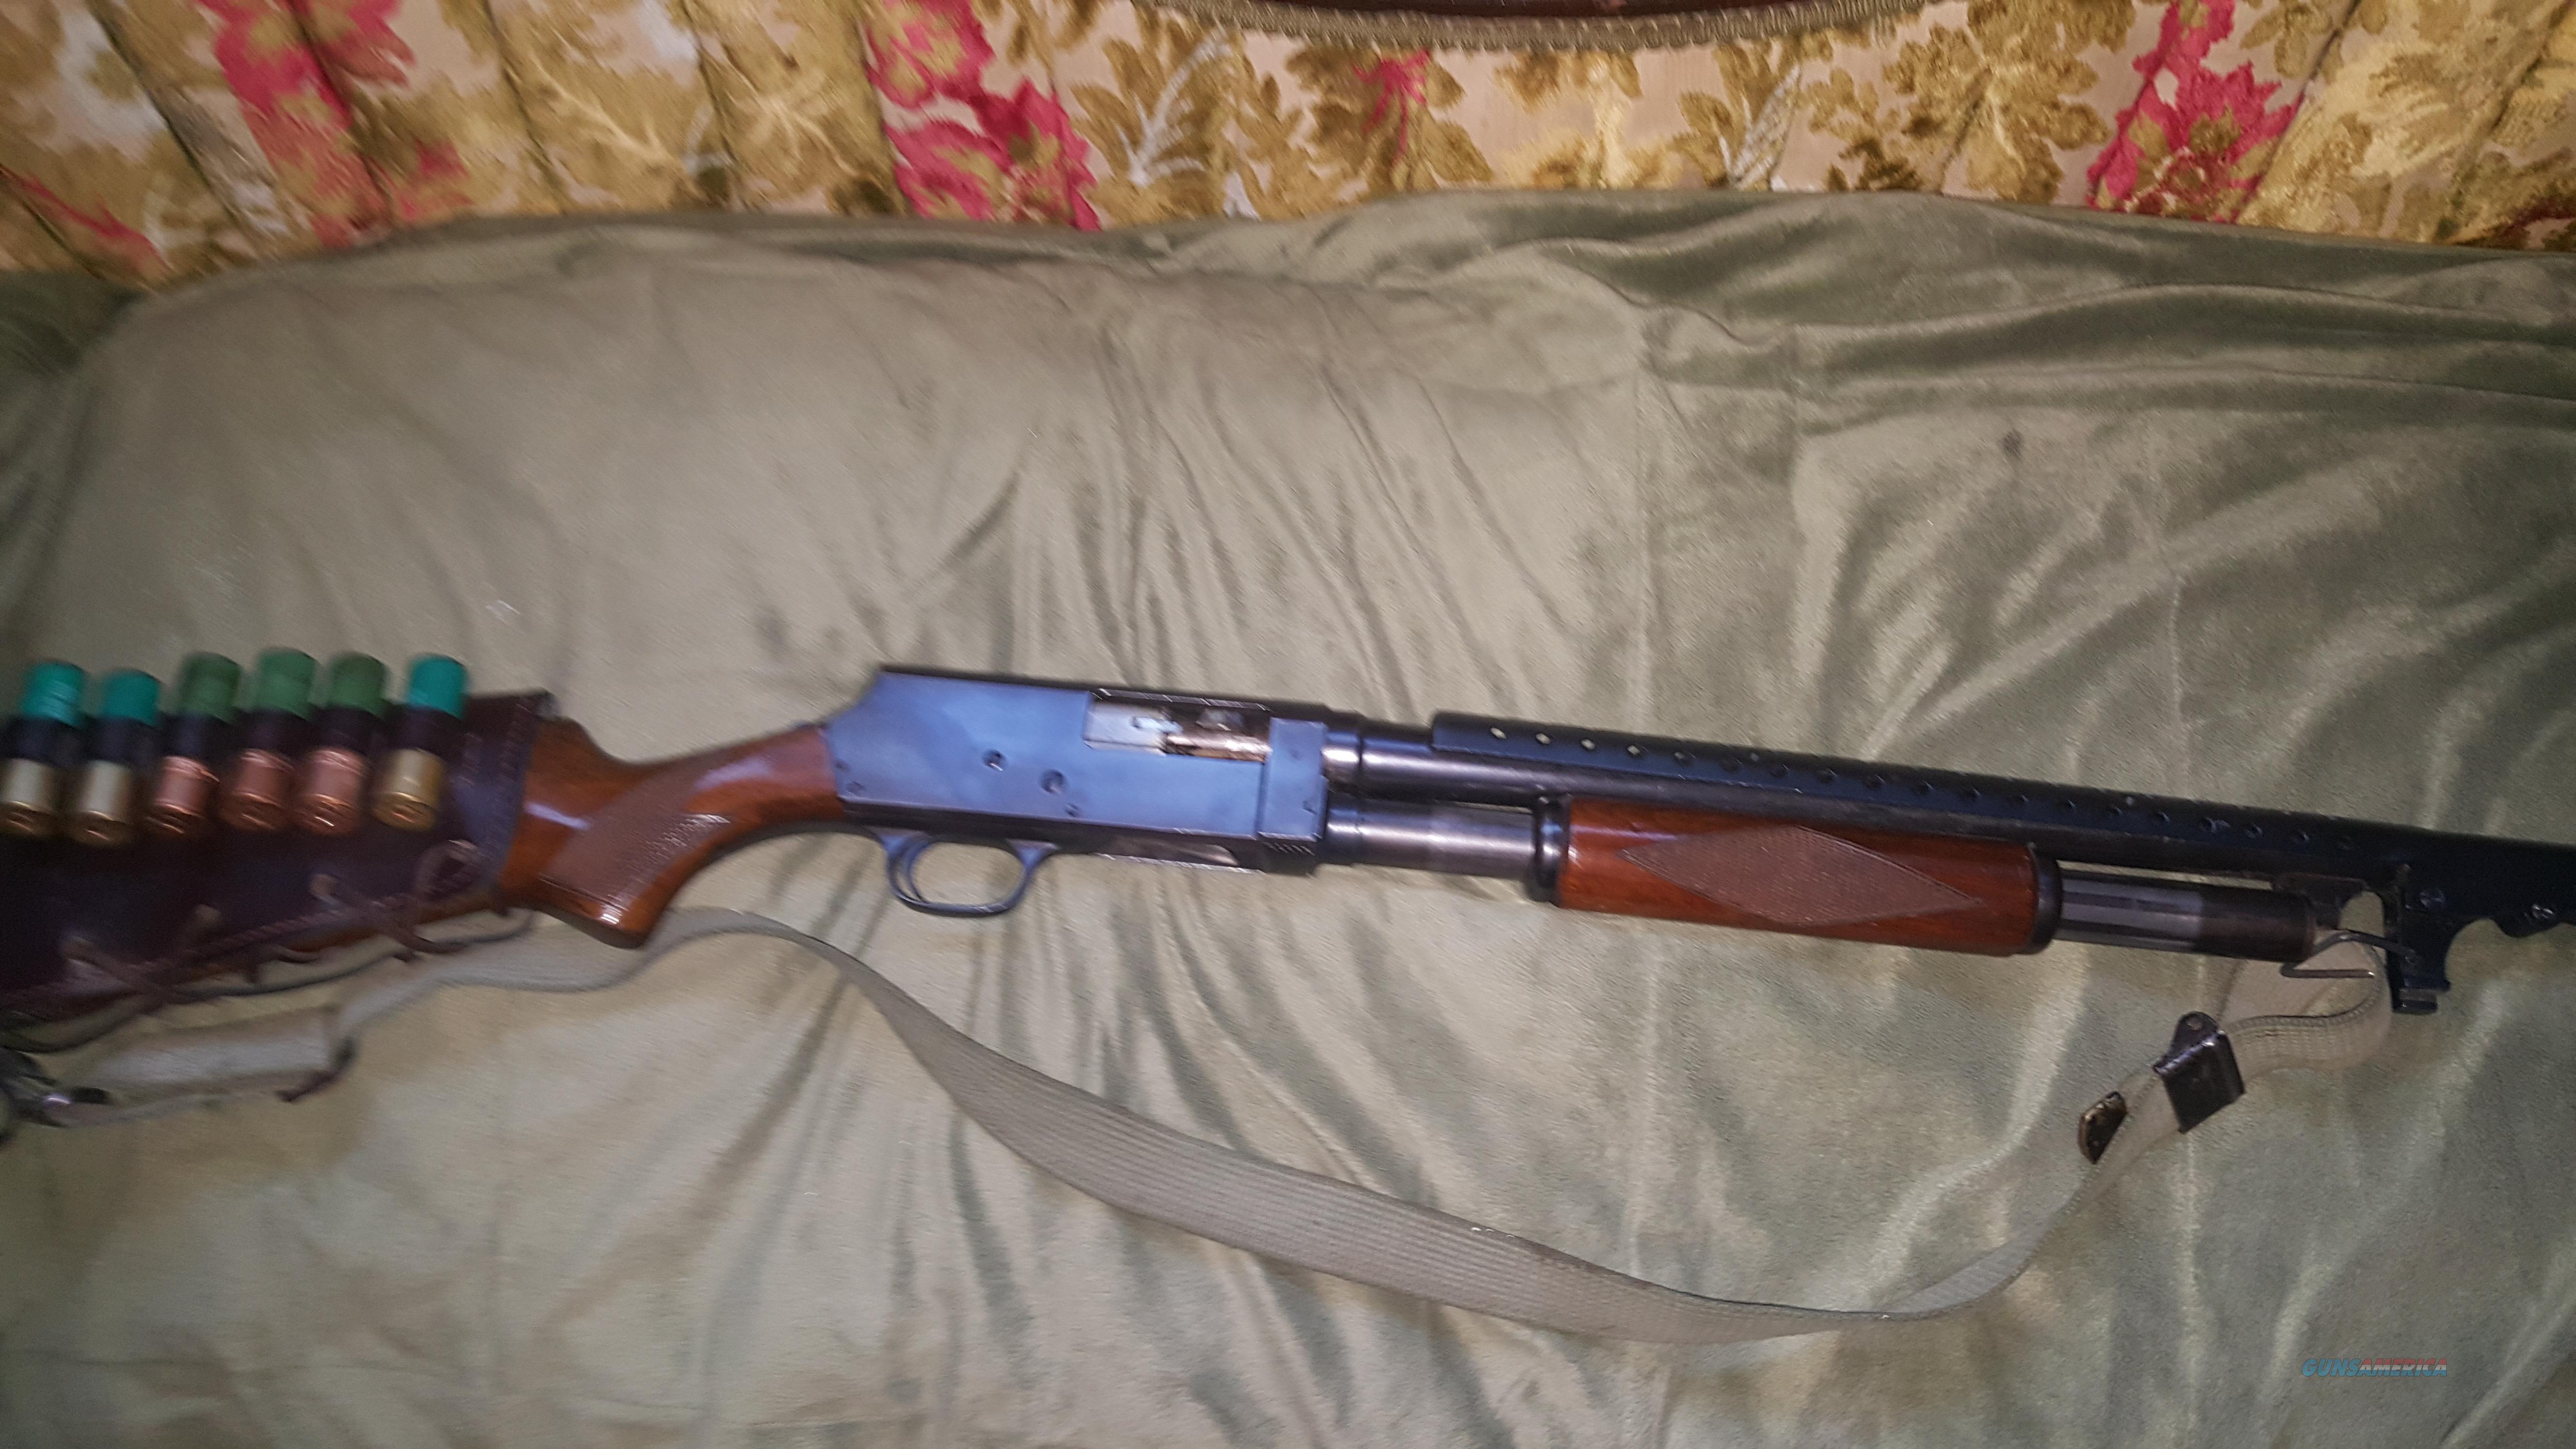 Savage-Stevens 12ga pump /with heatshield/baynot lug and sling  Guns > Shotguns > Savage Shotguns